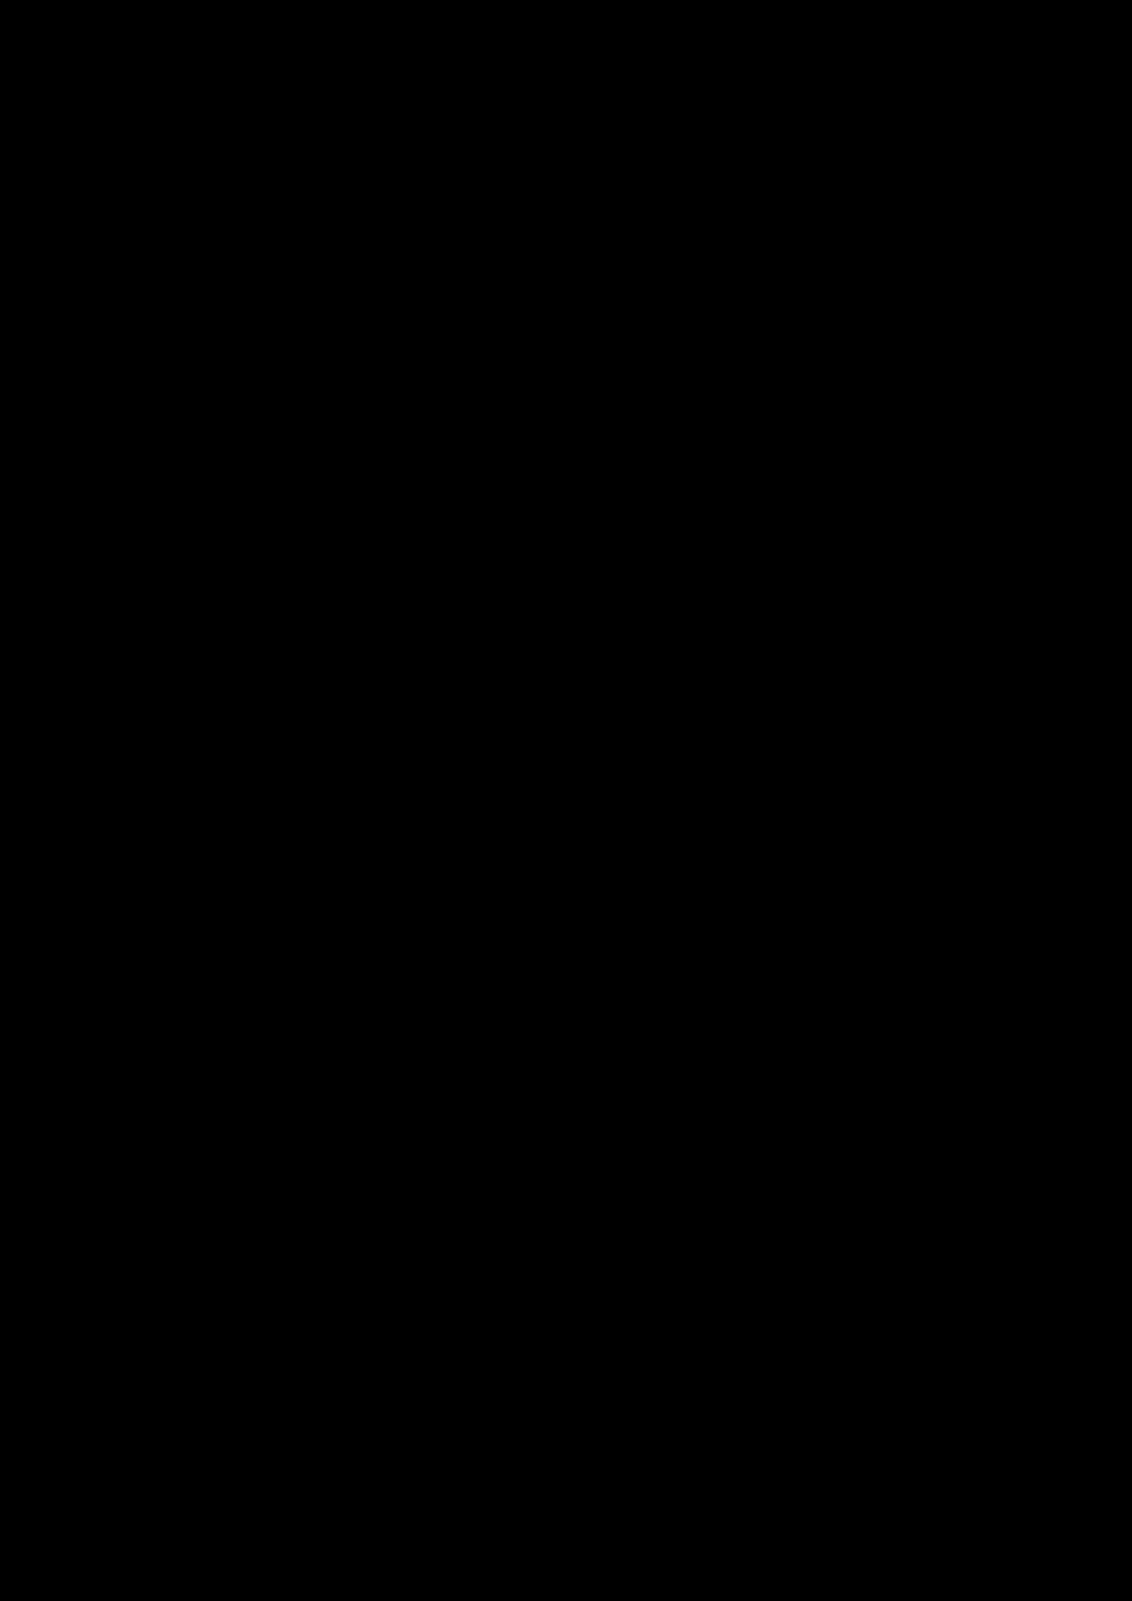 Romans o sleze slide, Image 15